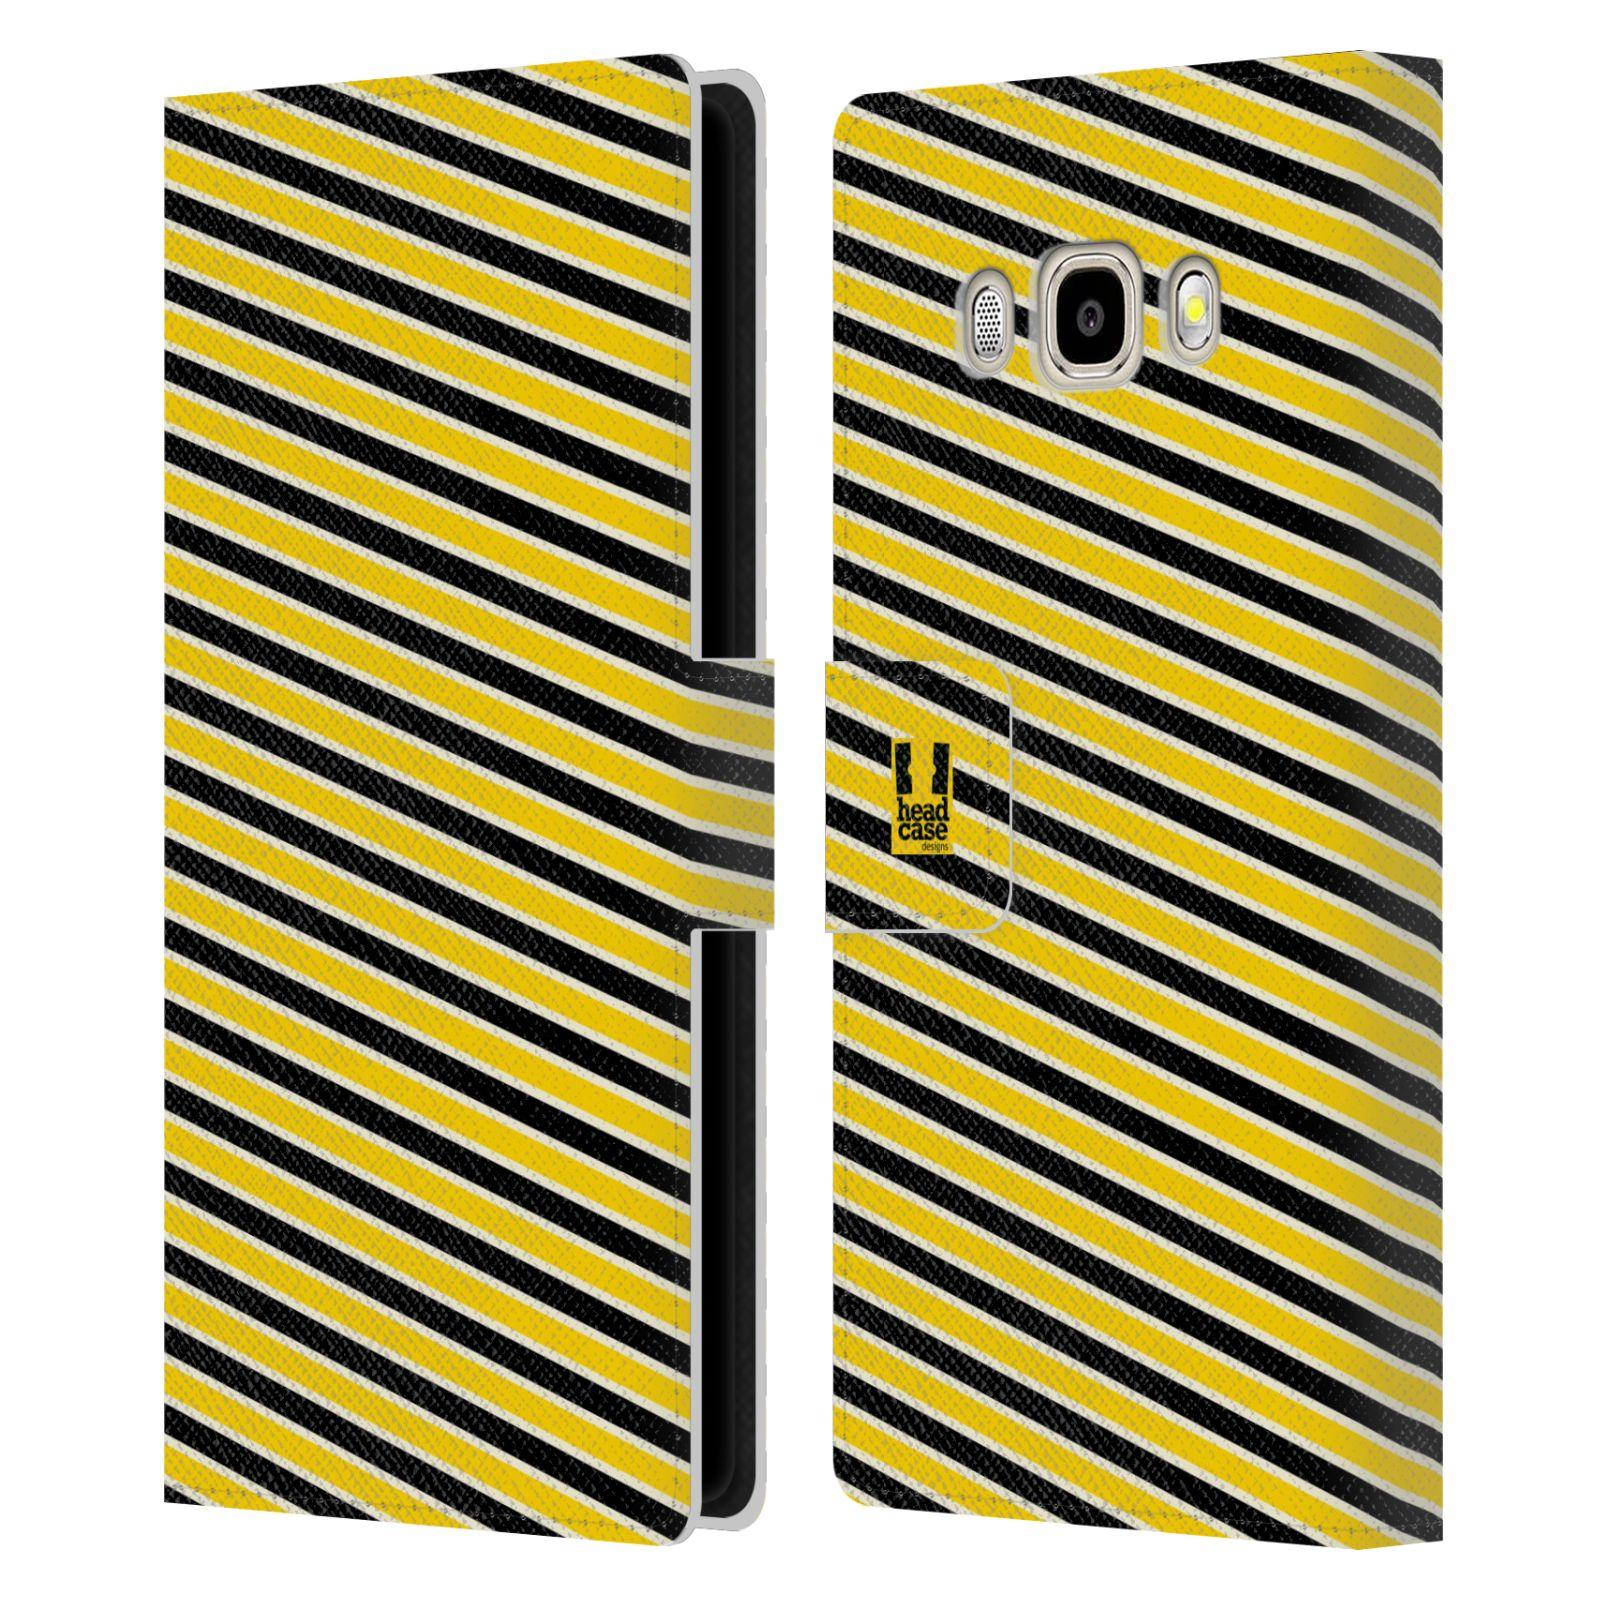 HEAD CASE Flipové pouzdro pro mobil Samsung Galaxy J5 2016 VČELÍ VZOR pruhy žlutá a černá